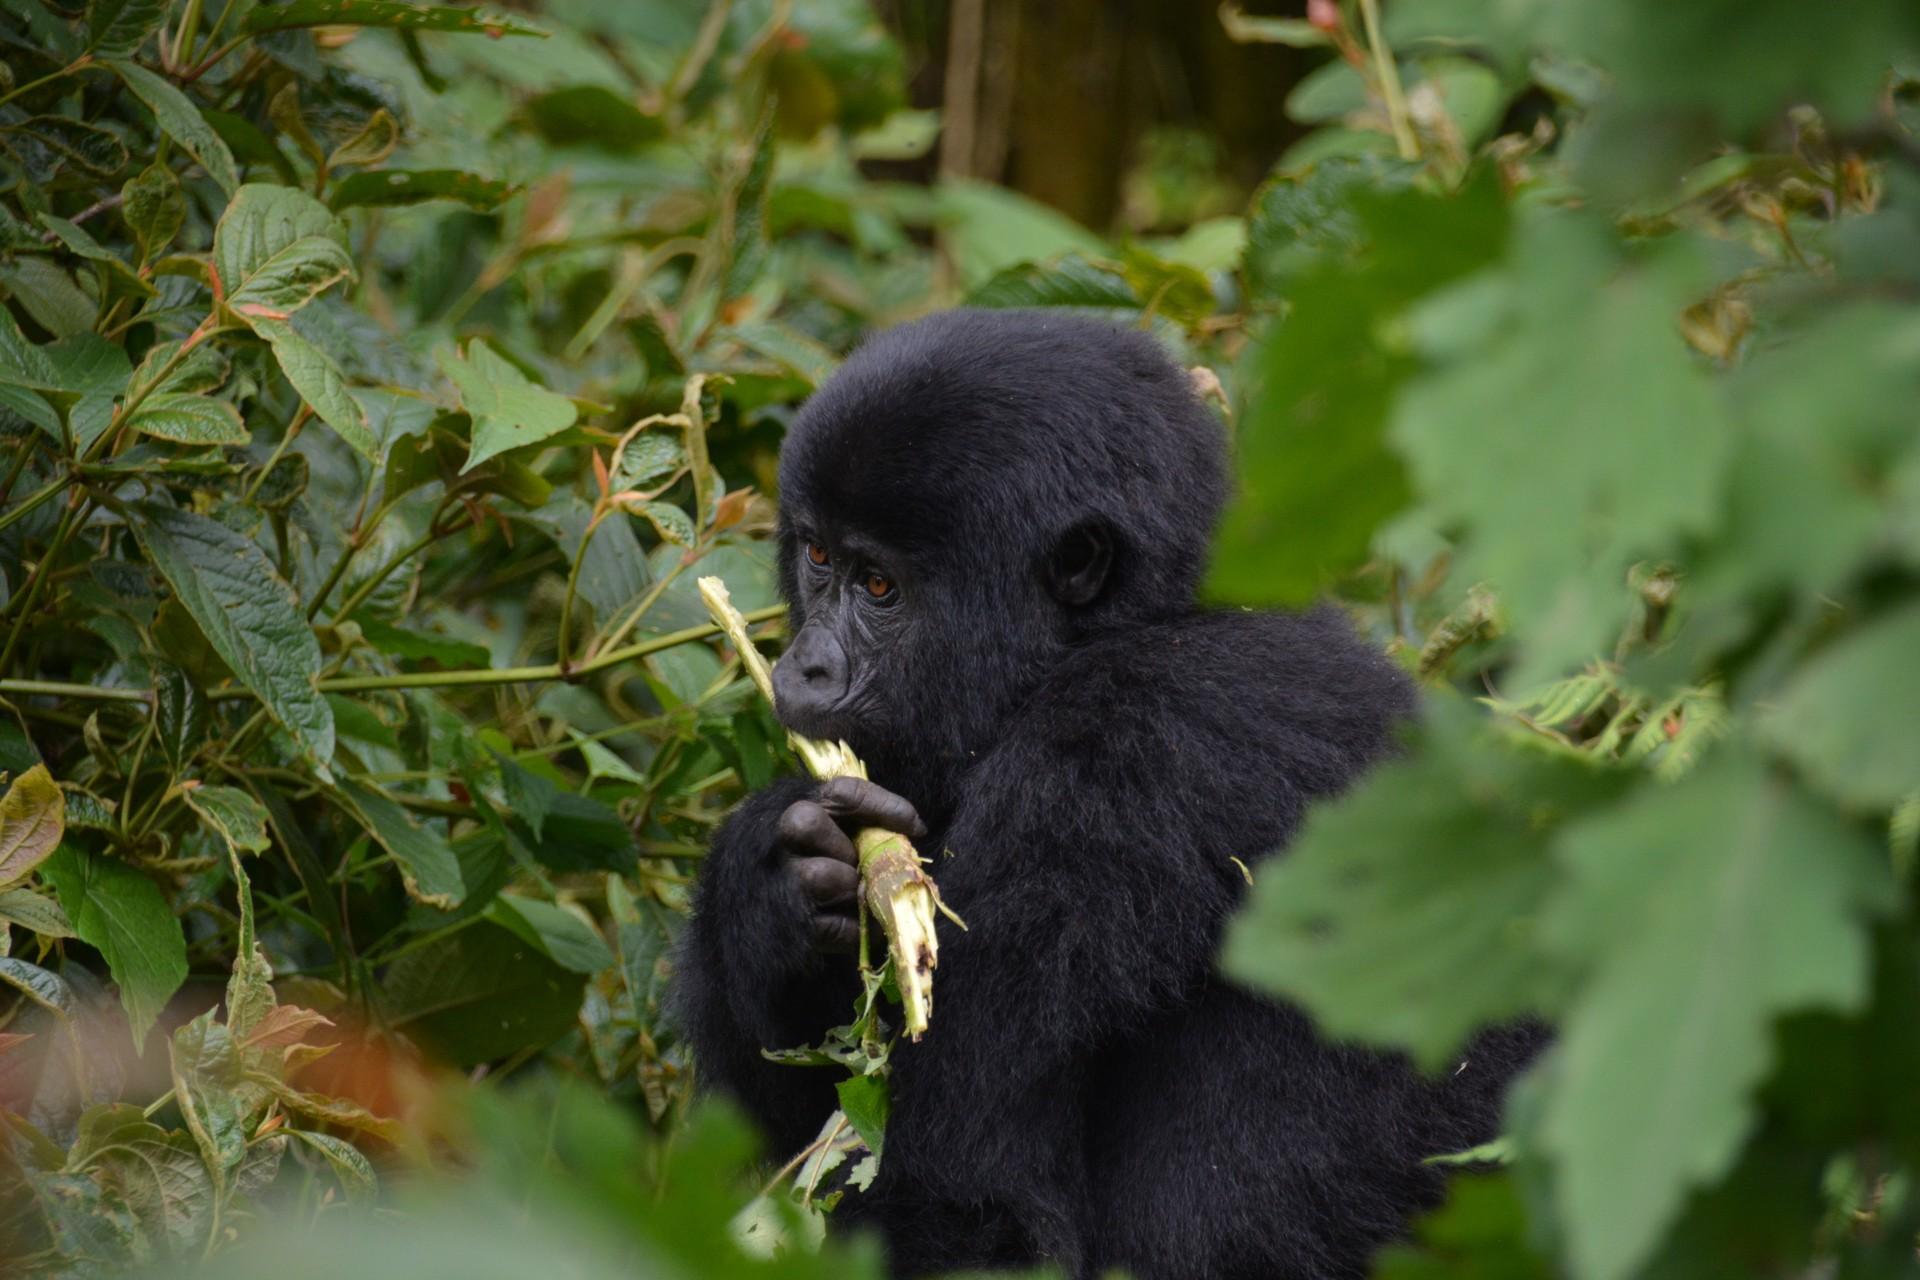 Young gorilla in Bwindi National Park, Uganda